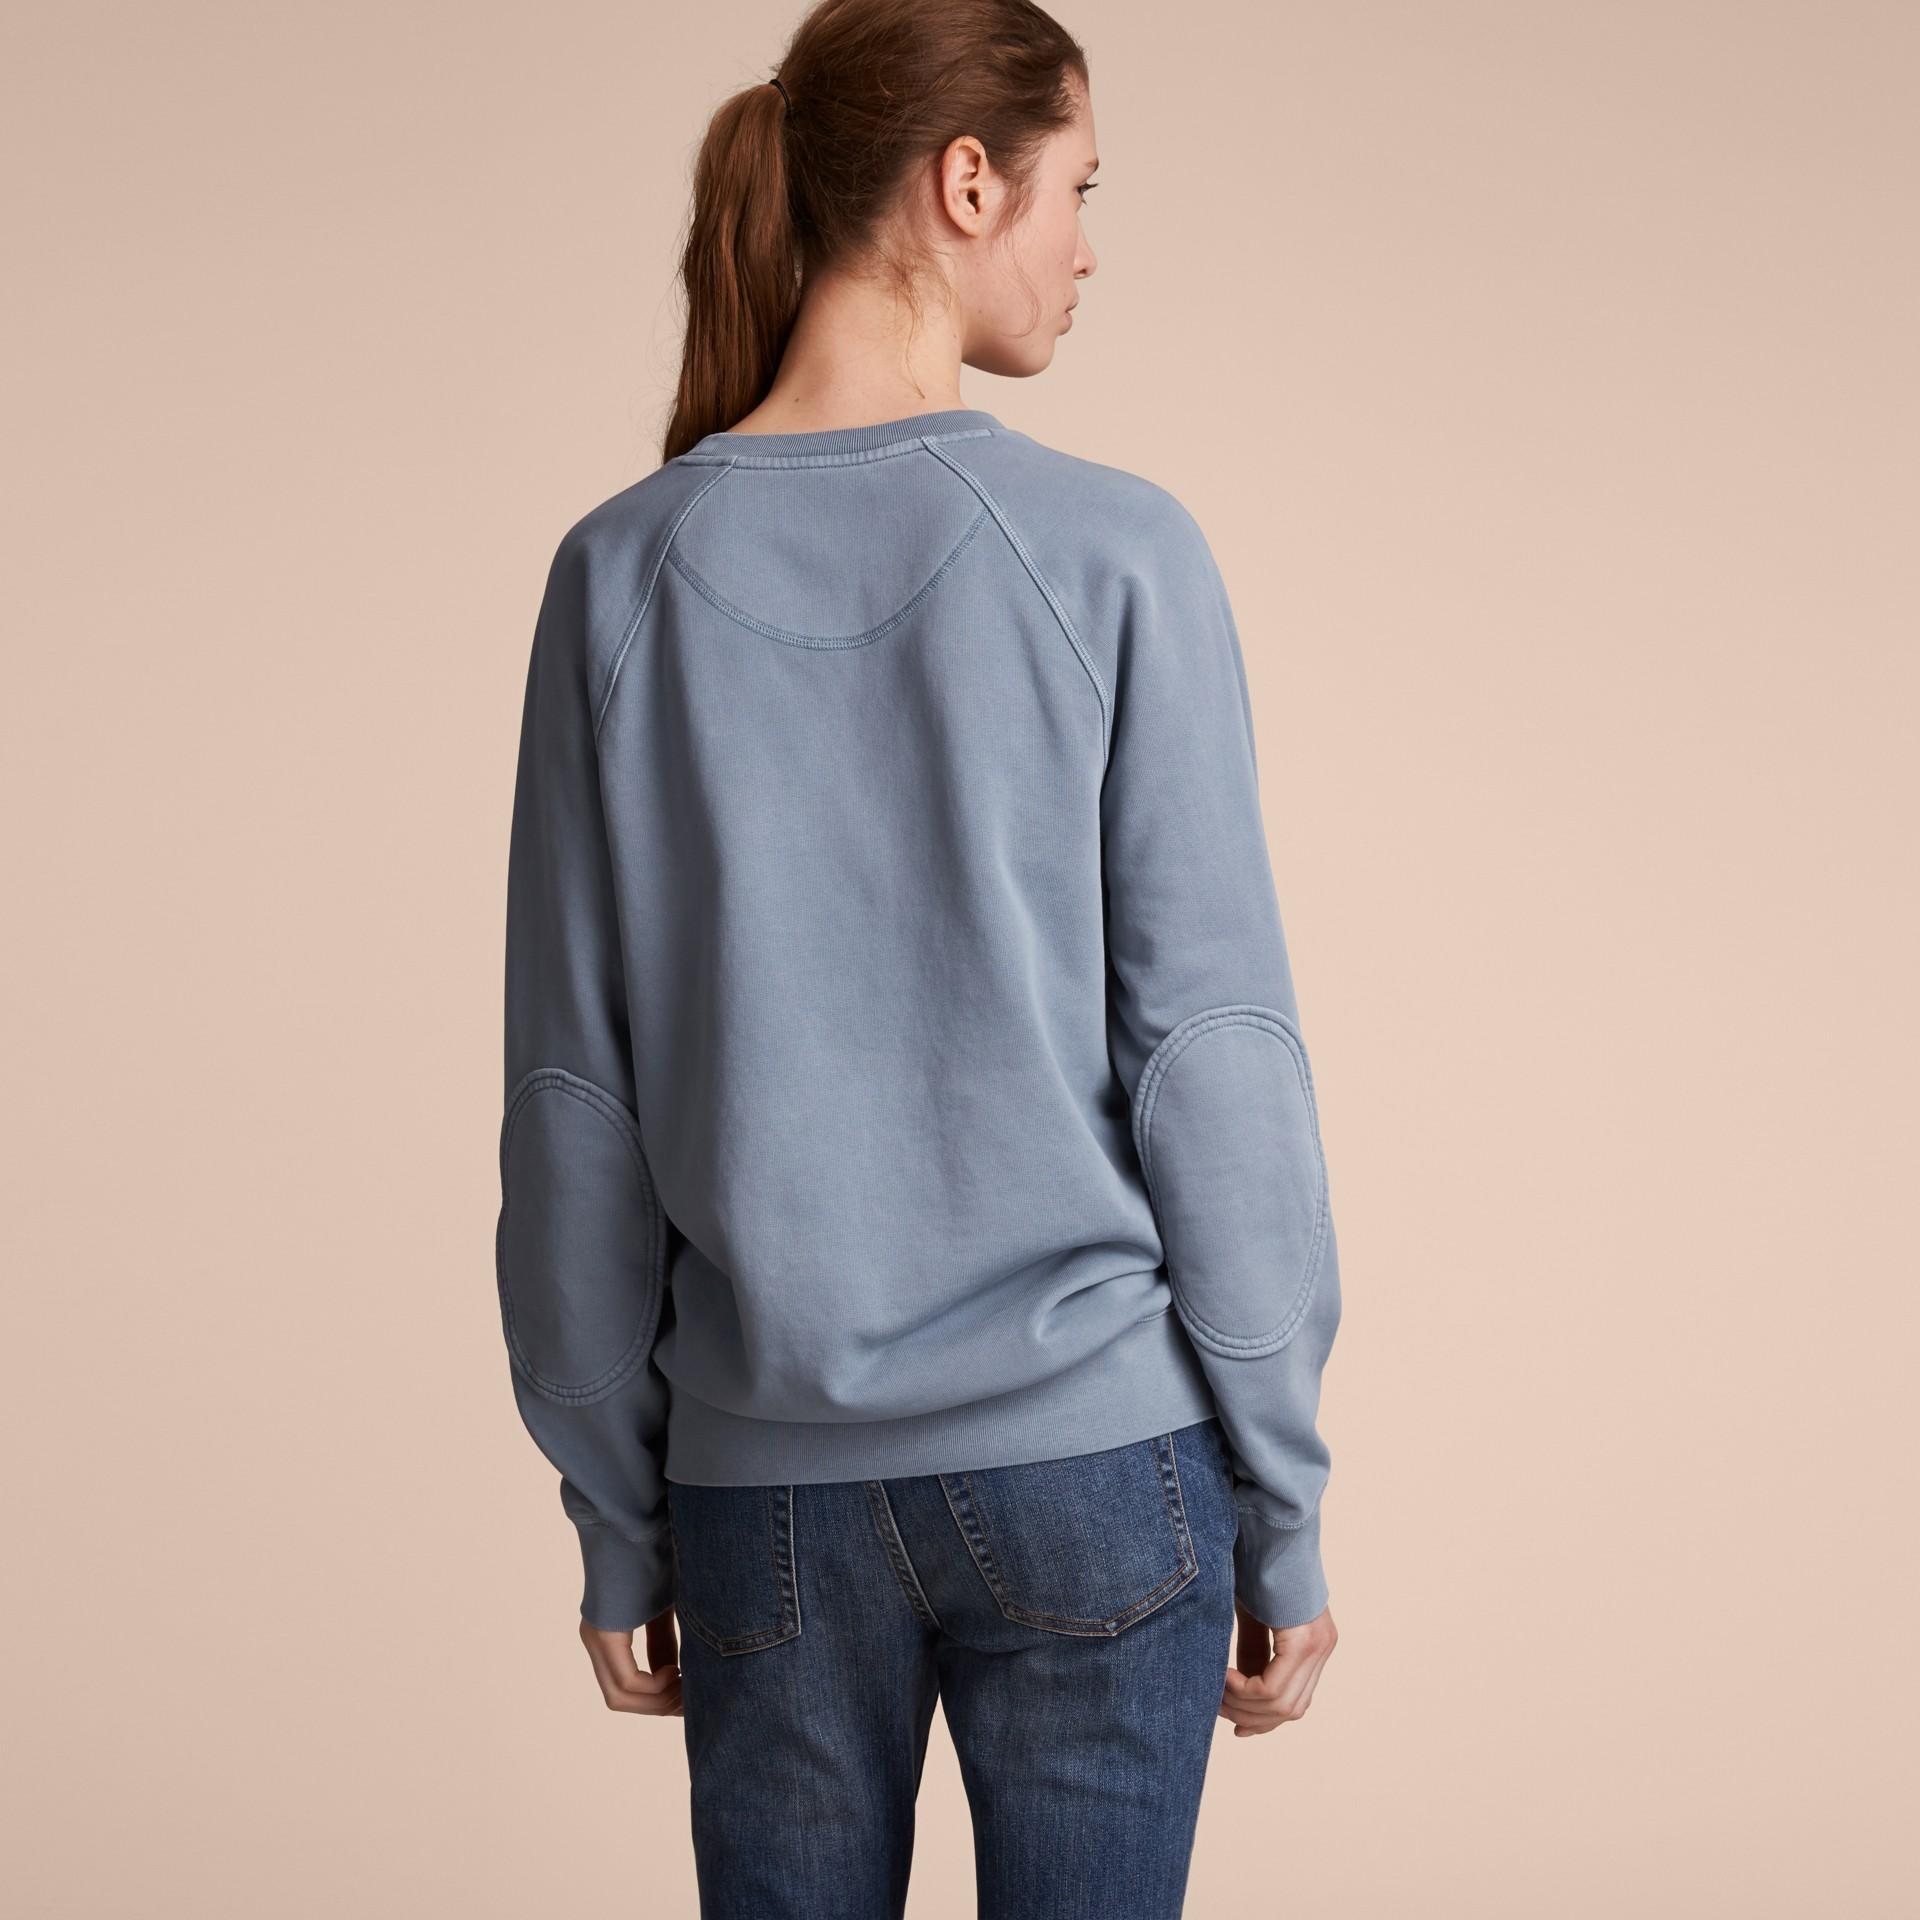 Unisex Pigment-dyed Cotton Oversize Sweatshirt in Dusty Blue - Women | Burberry Singapore - gallery image 7